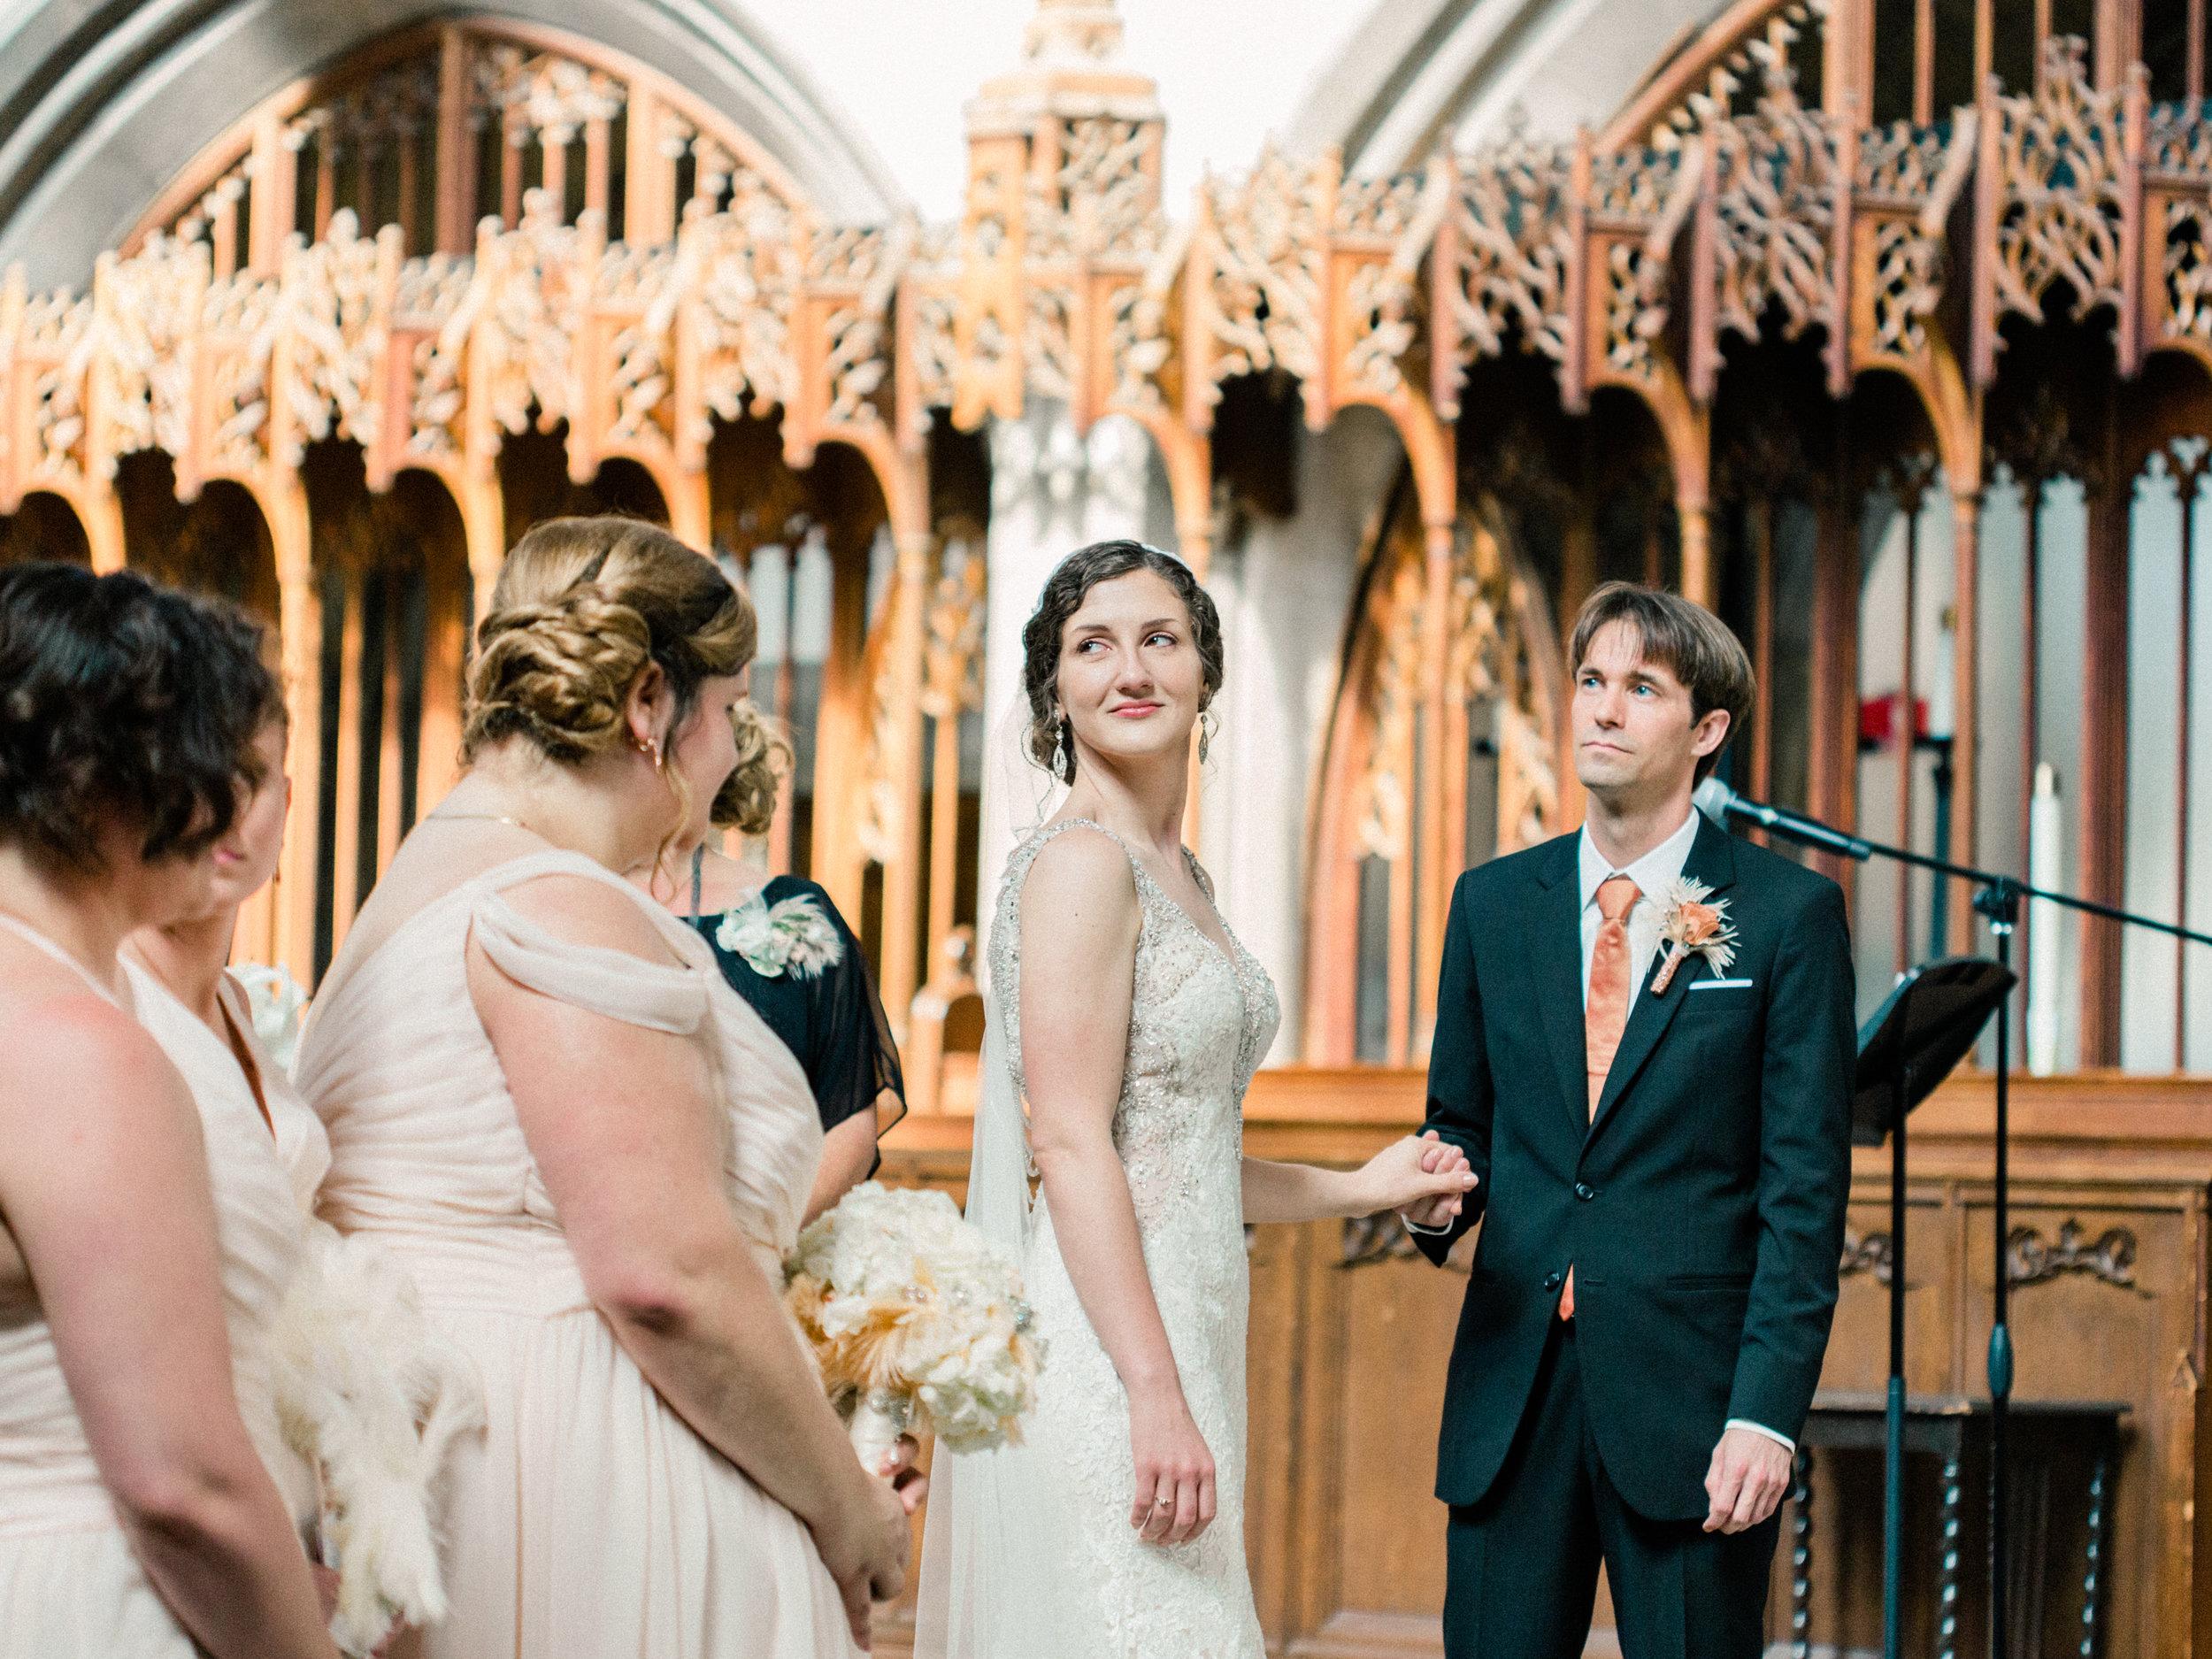 Dorothy_Louise_Photography_University_of_Chicago_Chapel_Wedding-23.jpg